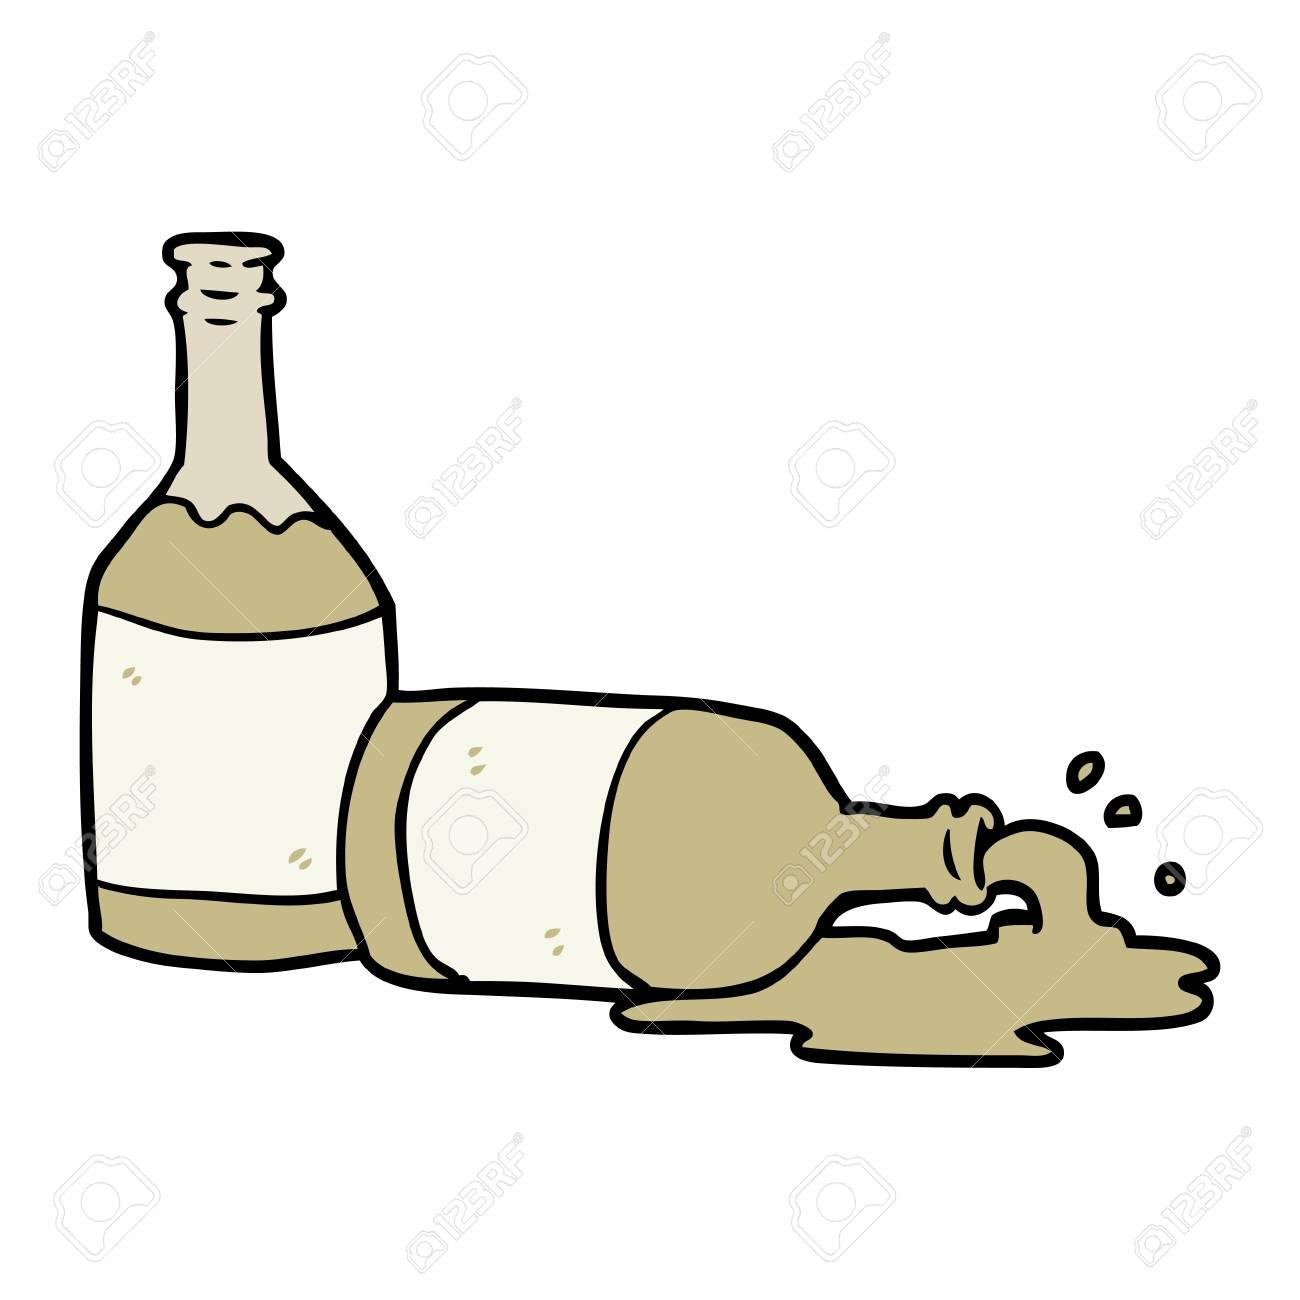 cartoon beer bottles with spilled beer.